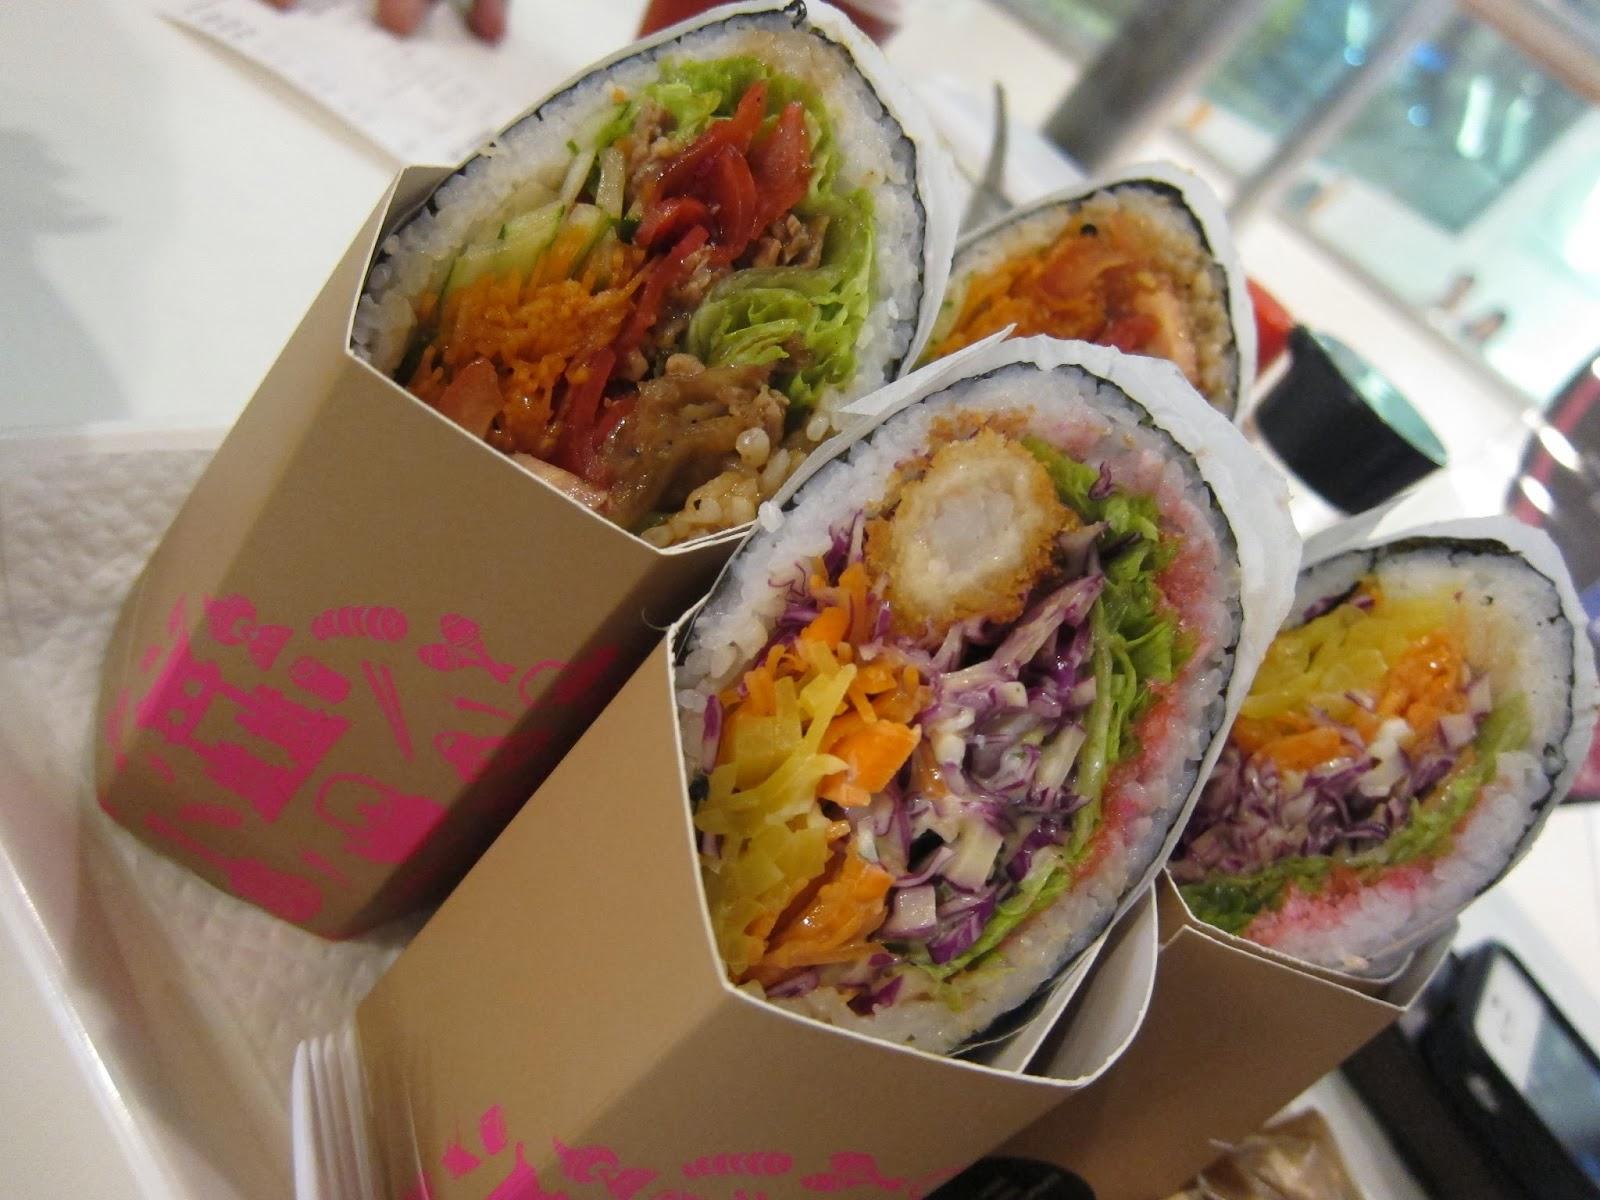 Eat. Drink. Dance. (Repeat!): Sushi Burrito Singapore